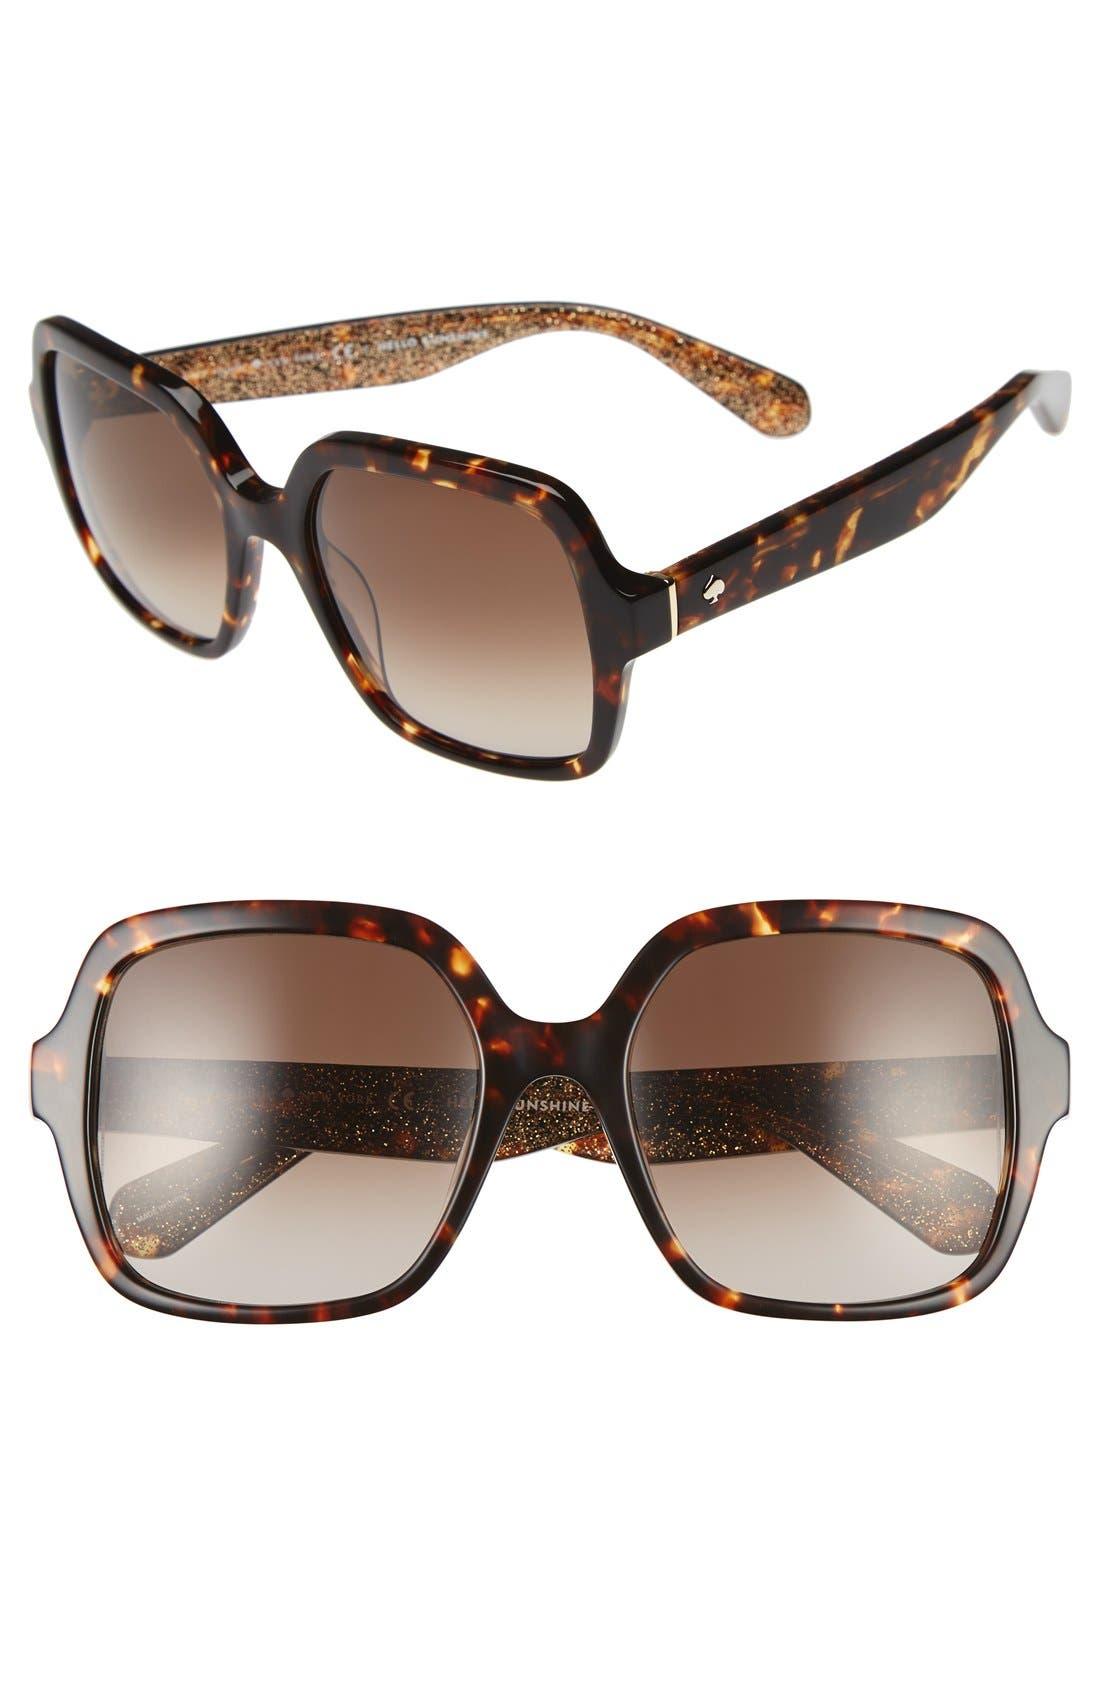 Main Image - kate spade new york 'katels' 54mm sunglasses